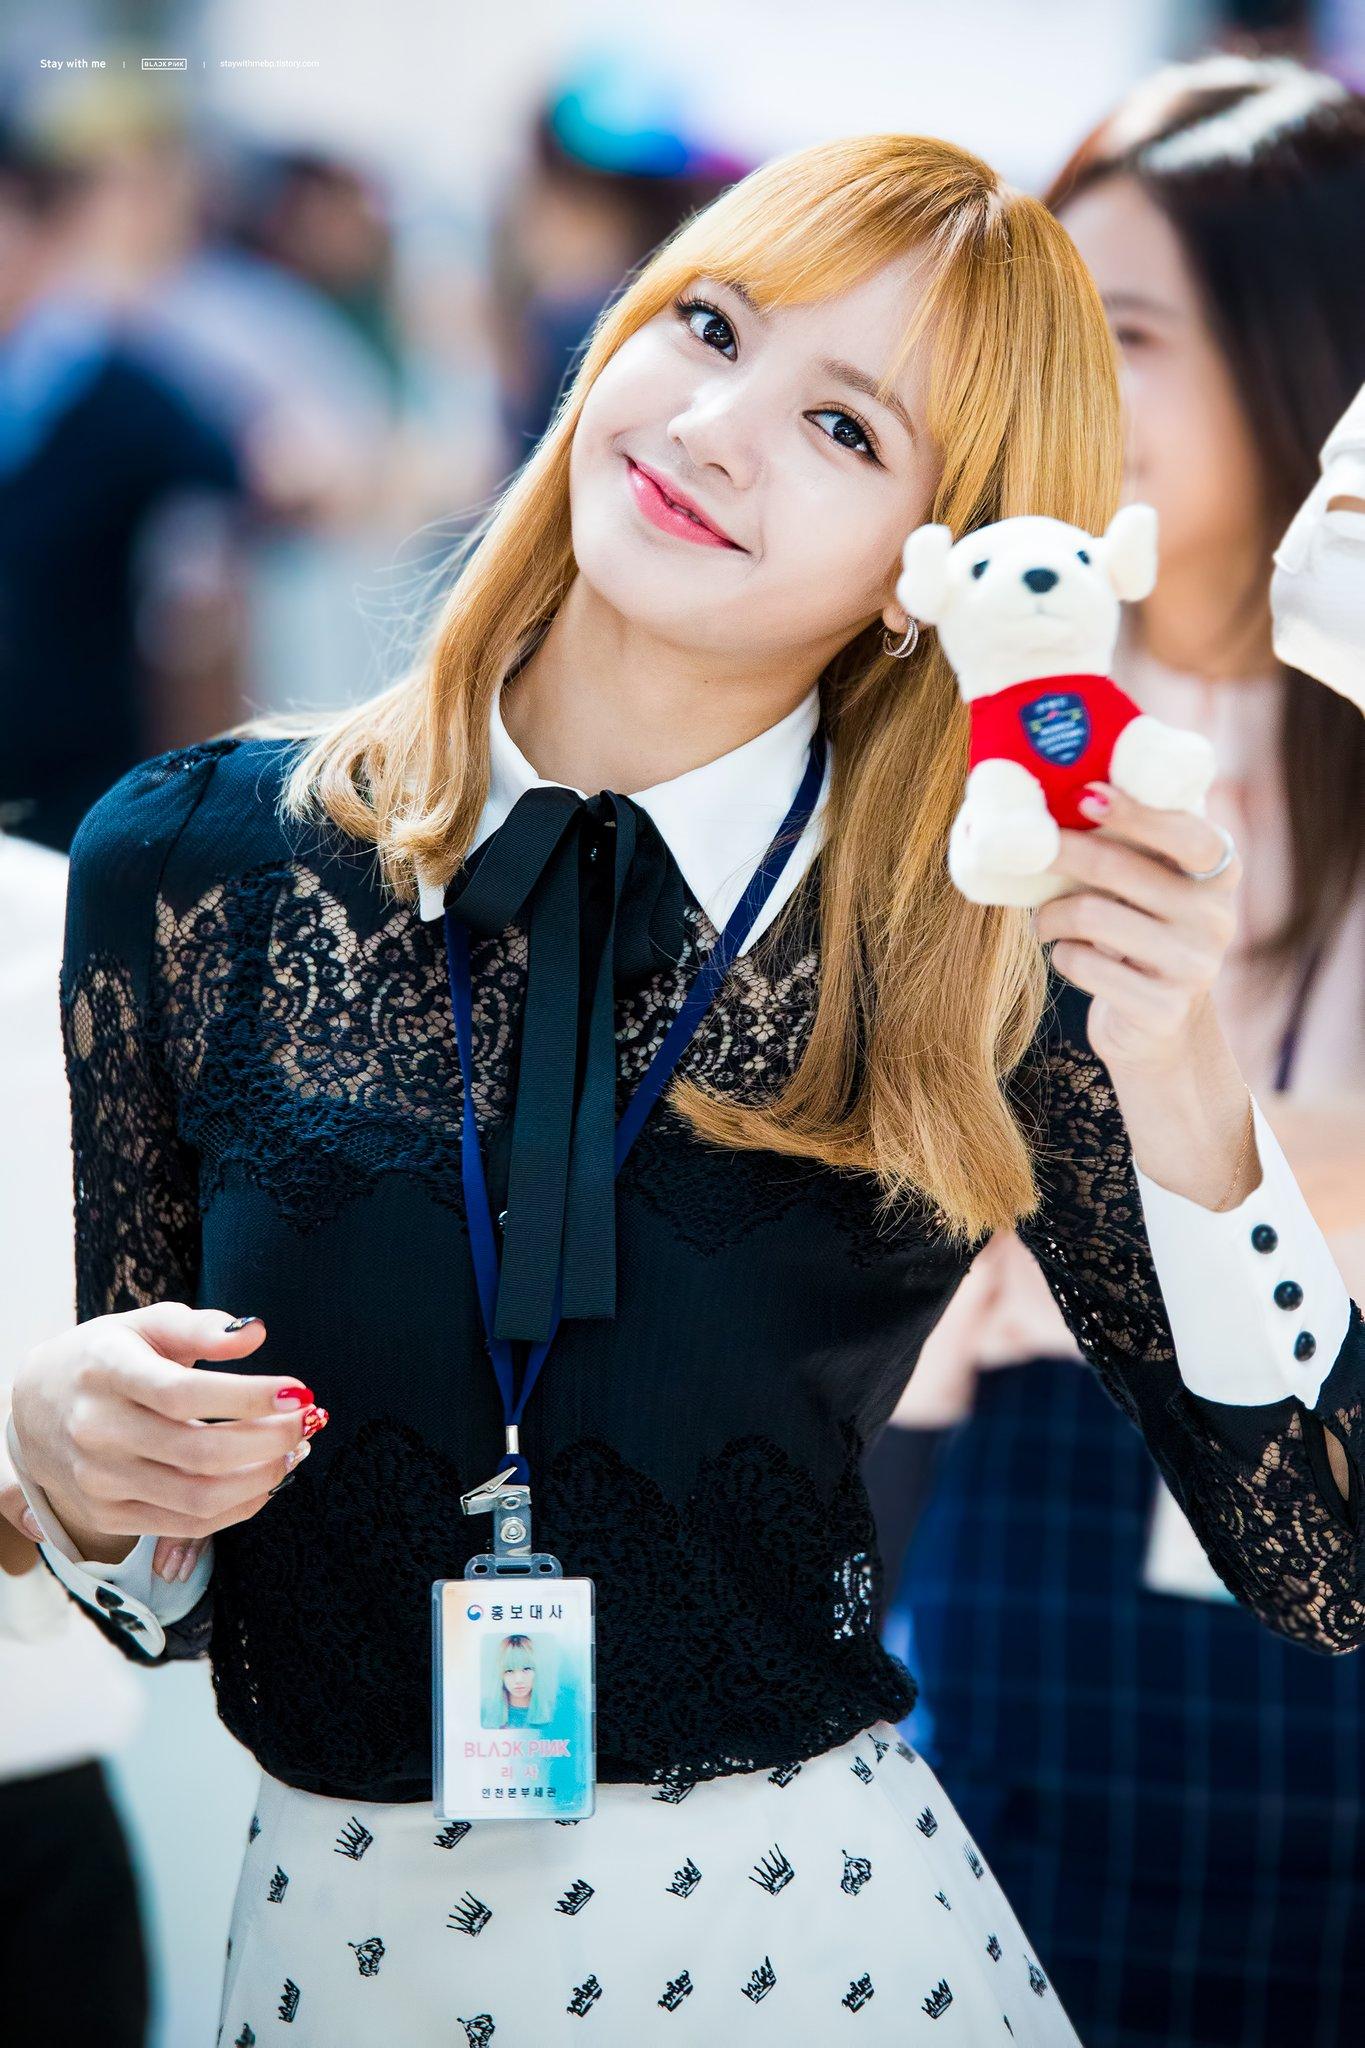 Imutnya Lisa dengan Boneka Kecil Kesayangannya